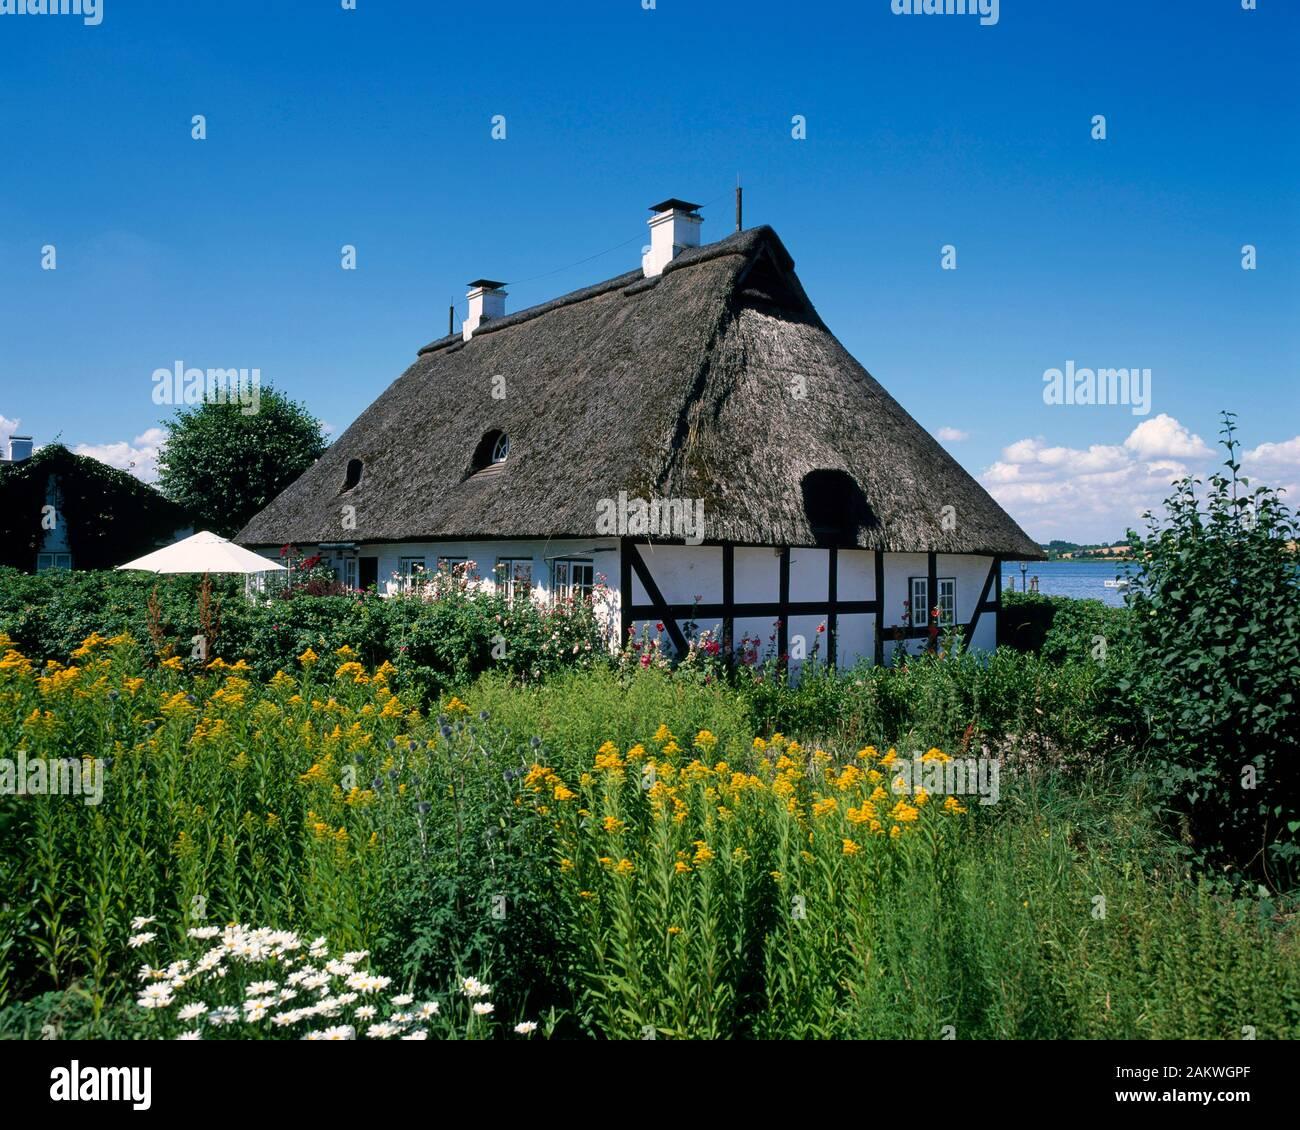 Sieseby, typical  house, Schlei, Balic Sea Coast, Schleswig-Holstein, Germany Stock Photo